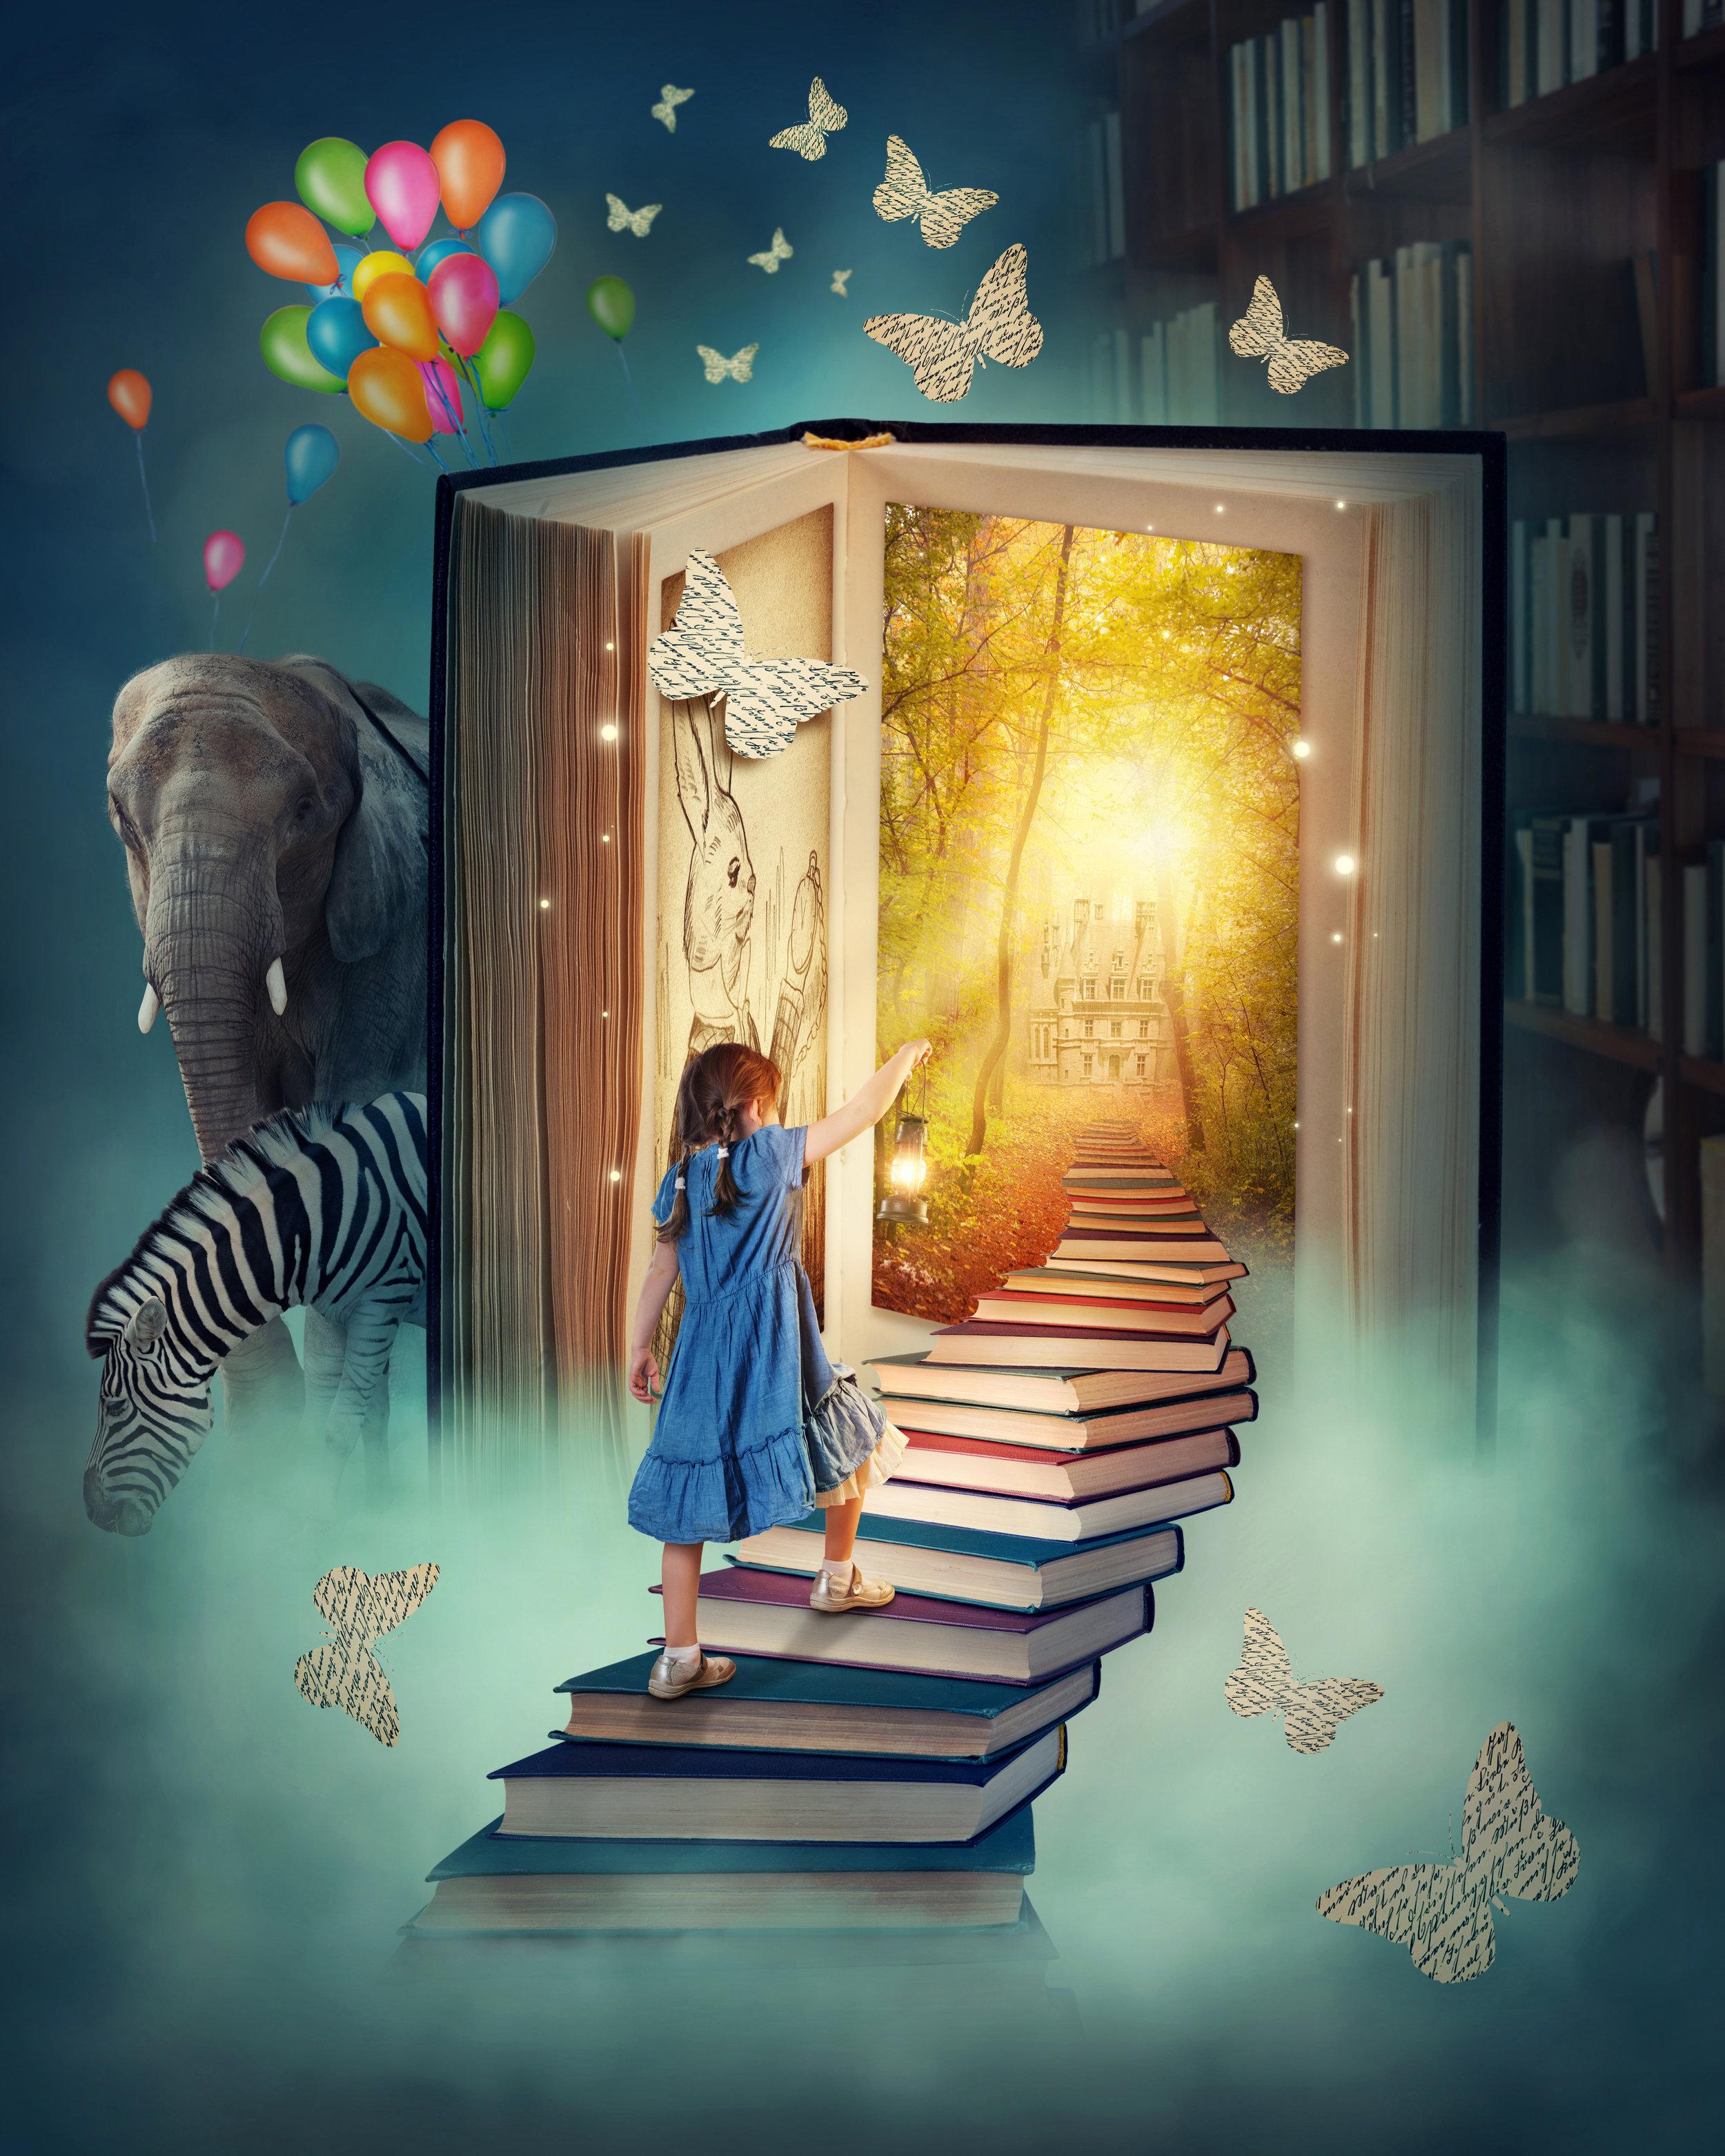 Shutterstock image - (https://www.shutterstock.com/image-photo/little-girl-walking-stairs-magic-book-124521184?src=JGWOTJssCqOKGms0dsDq9Q-1-12)